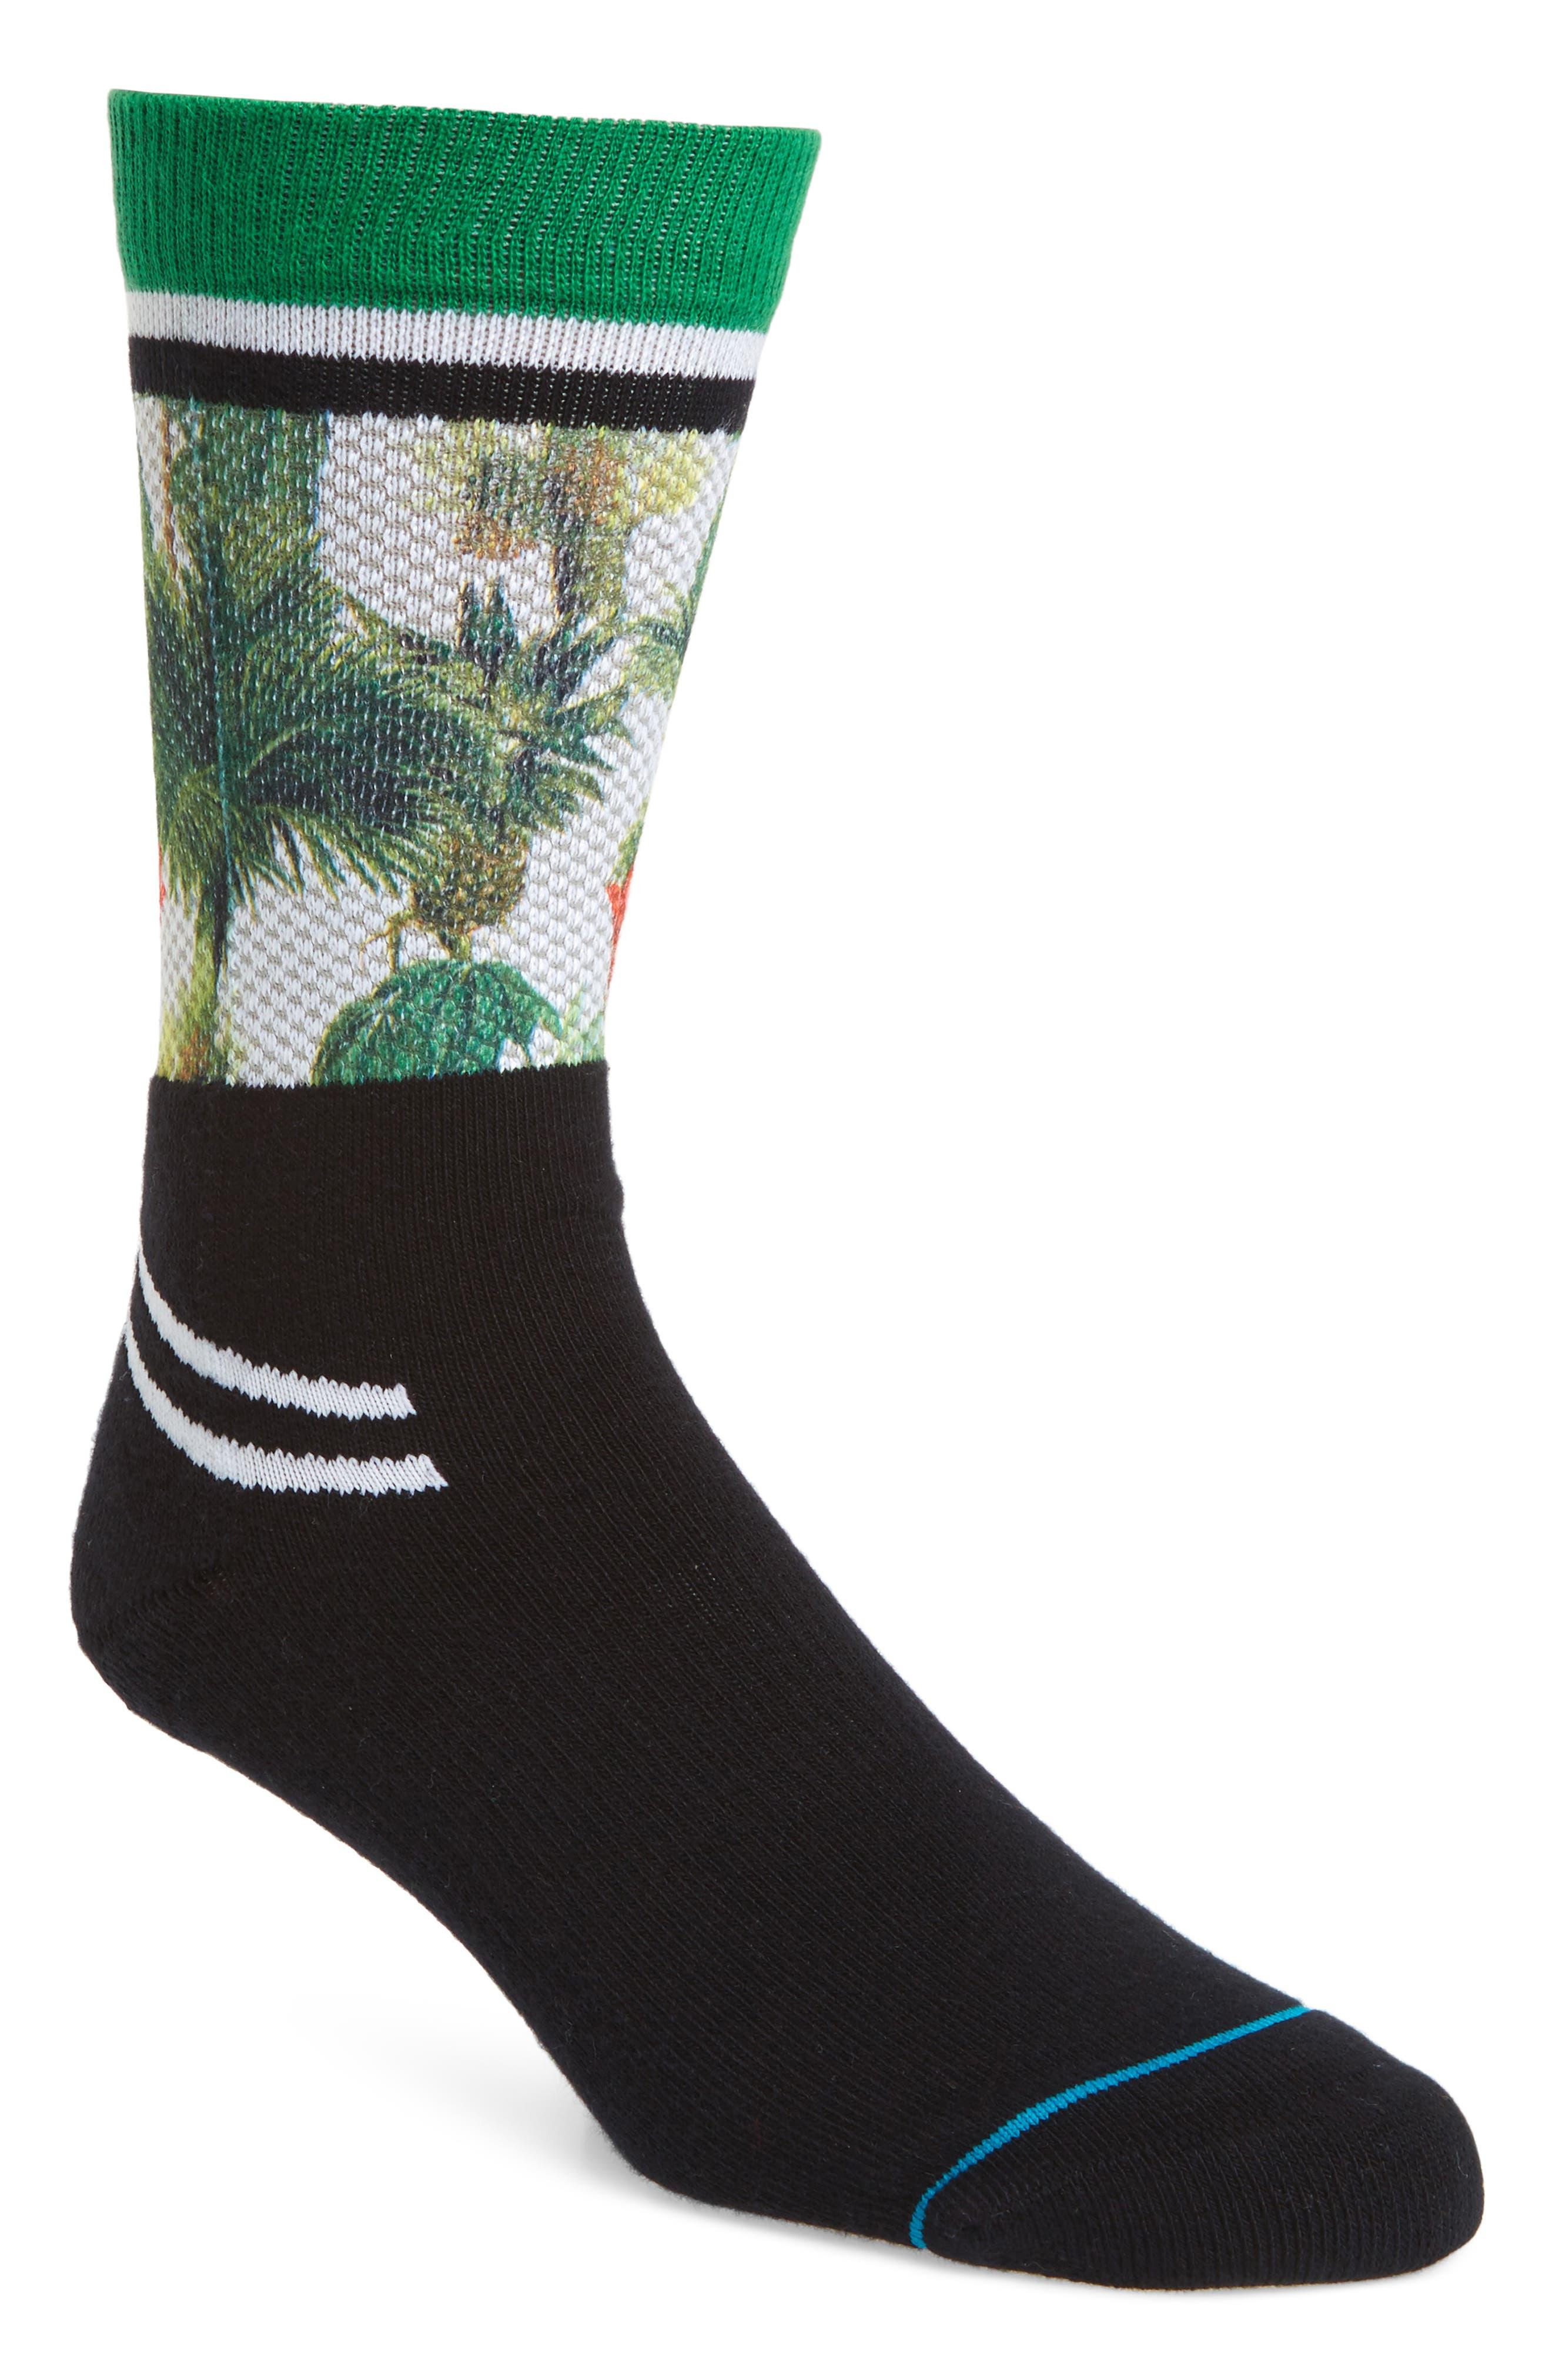 Stance Bring the Heath Crew Socks